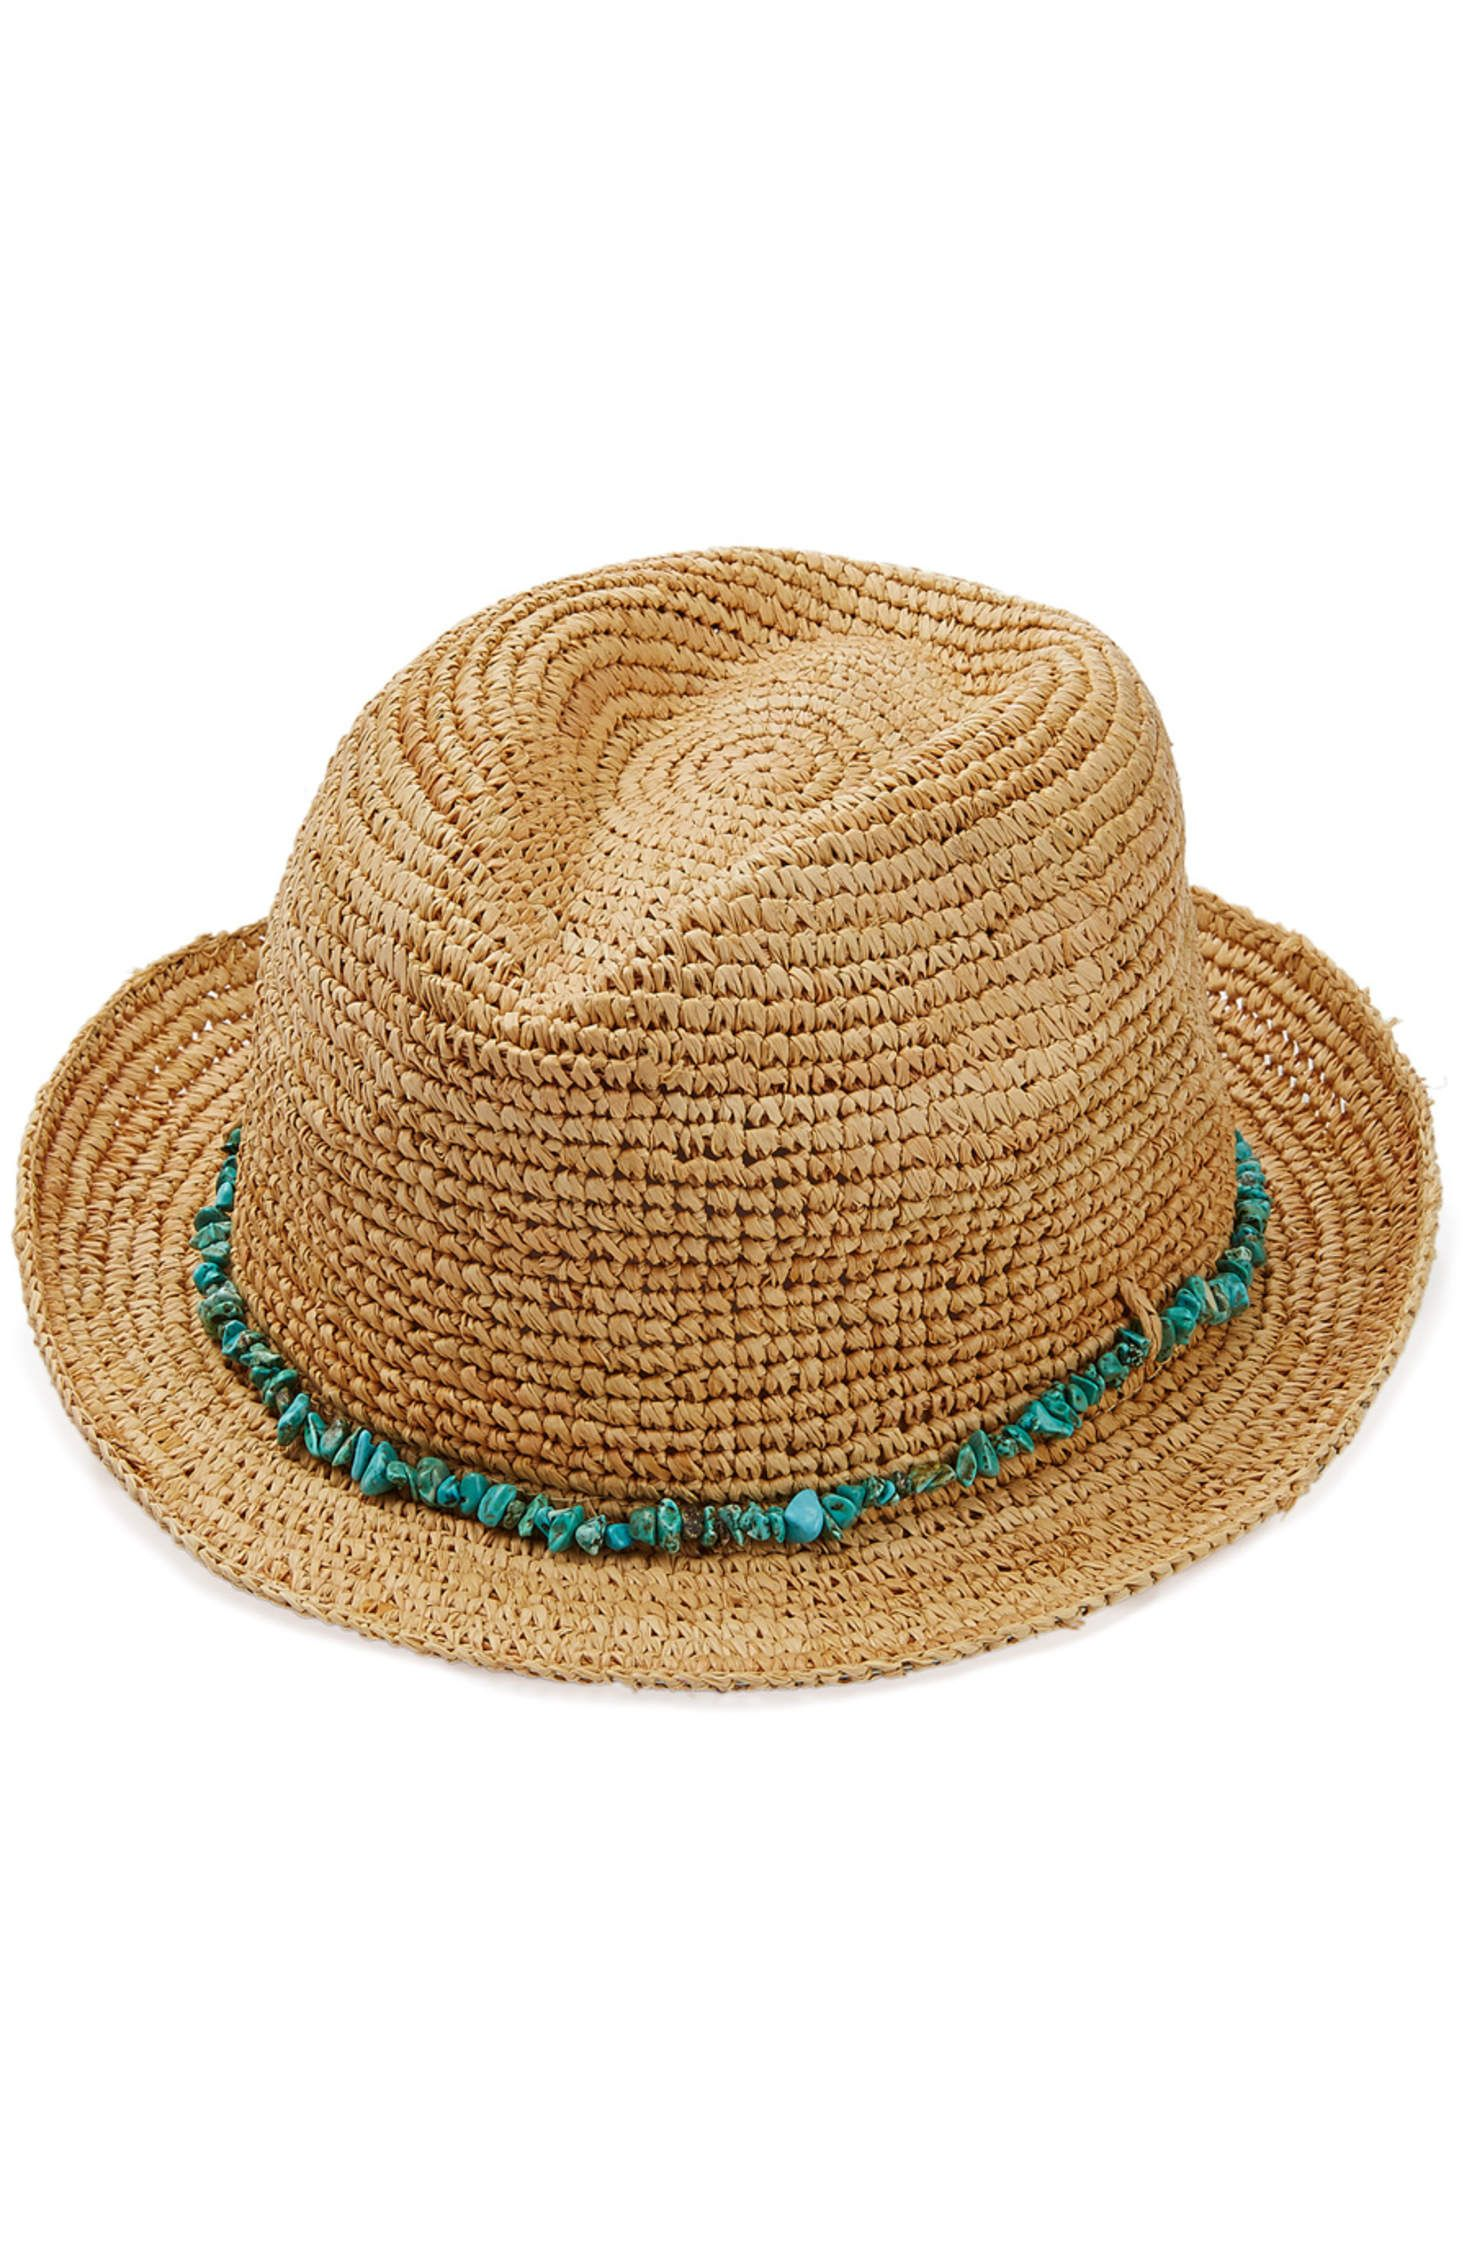 Melissa Odabash - Embellished Raffia Hat  b67326f07cb2